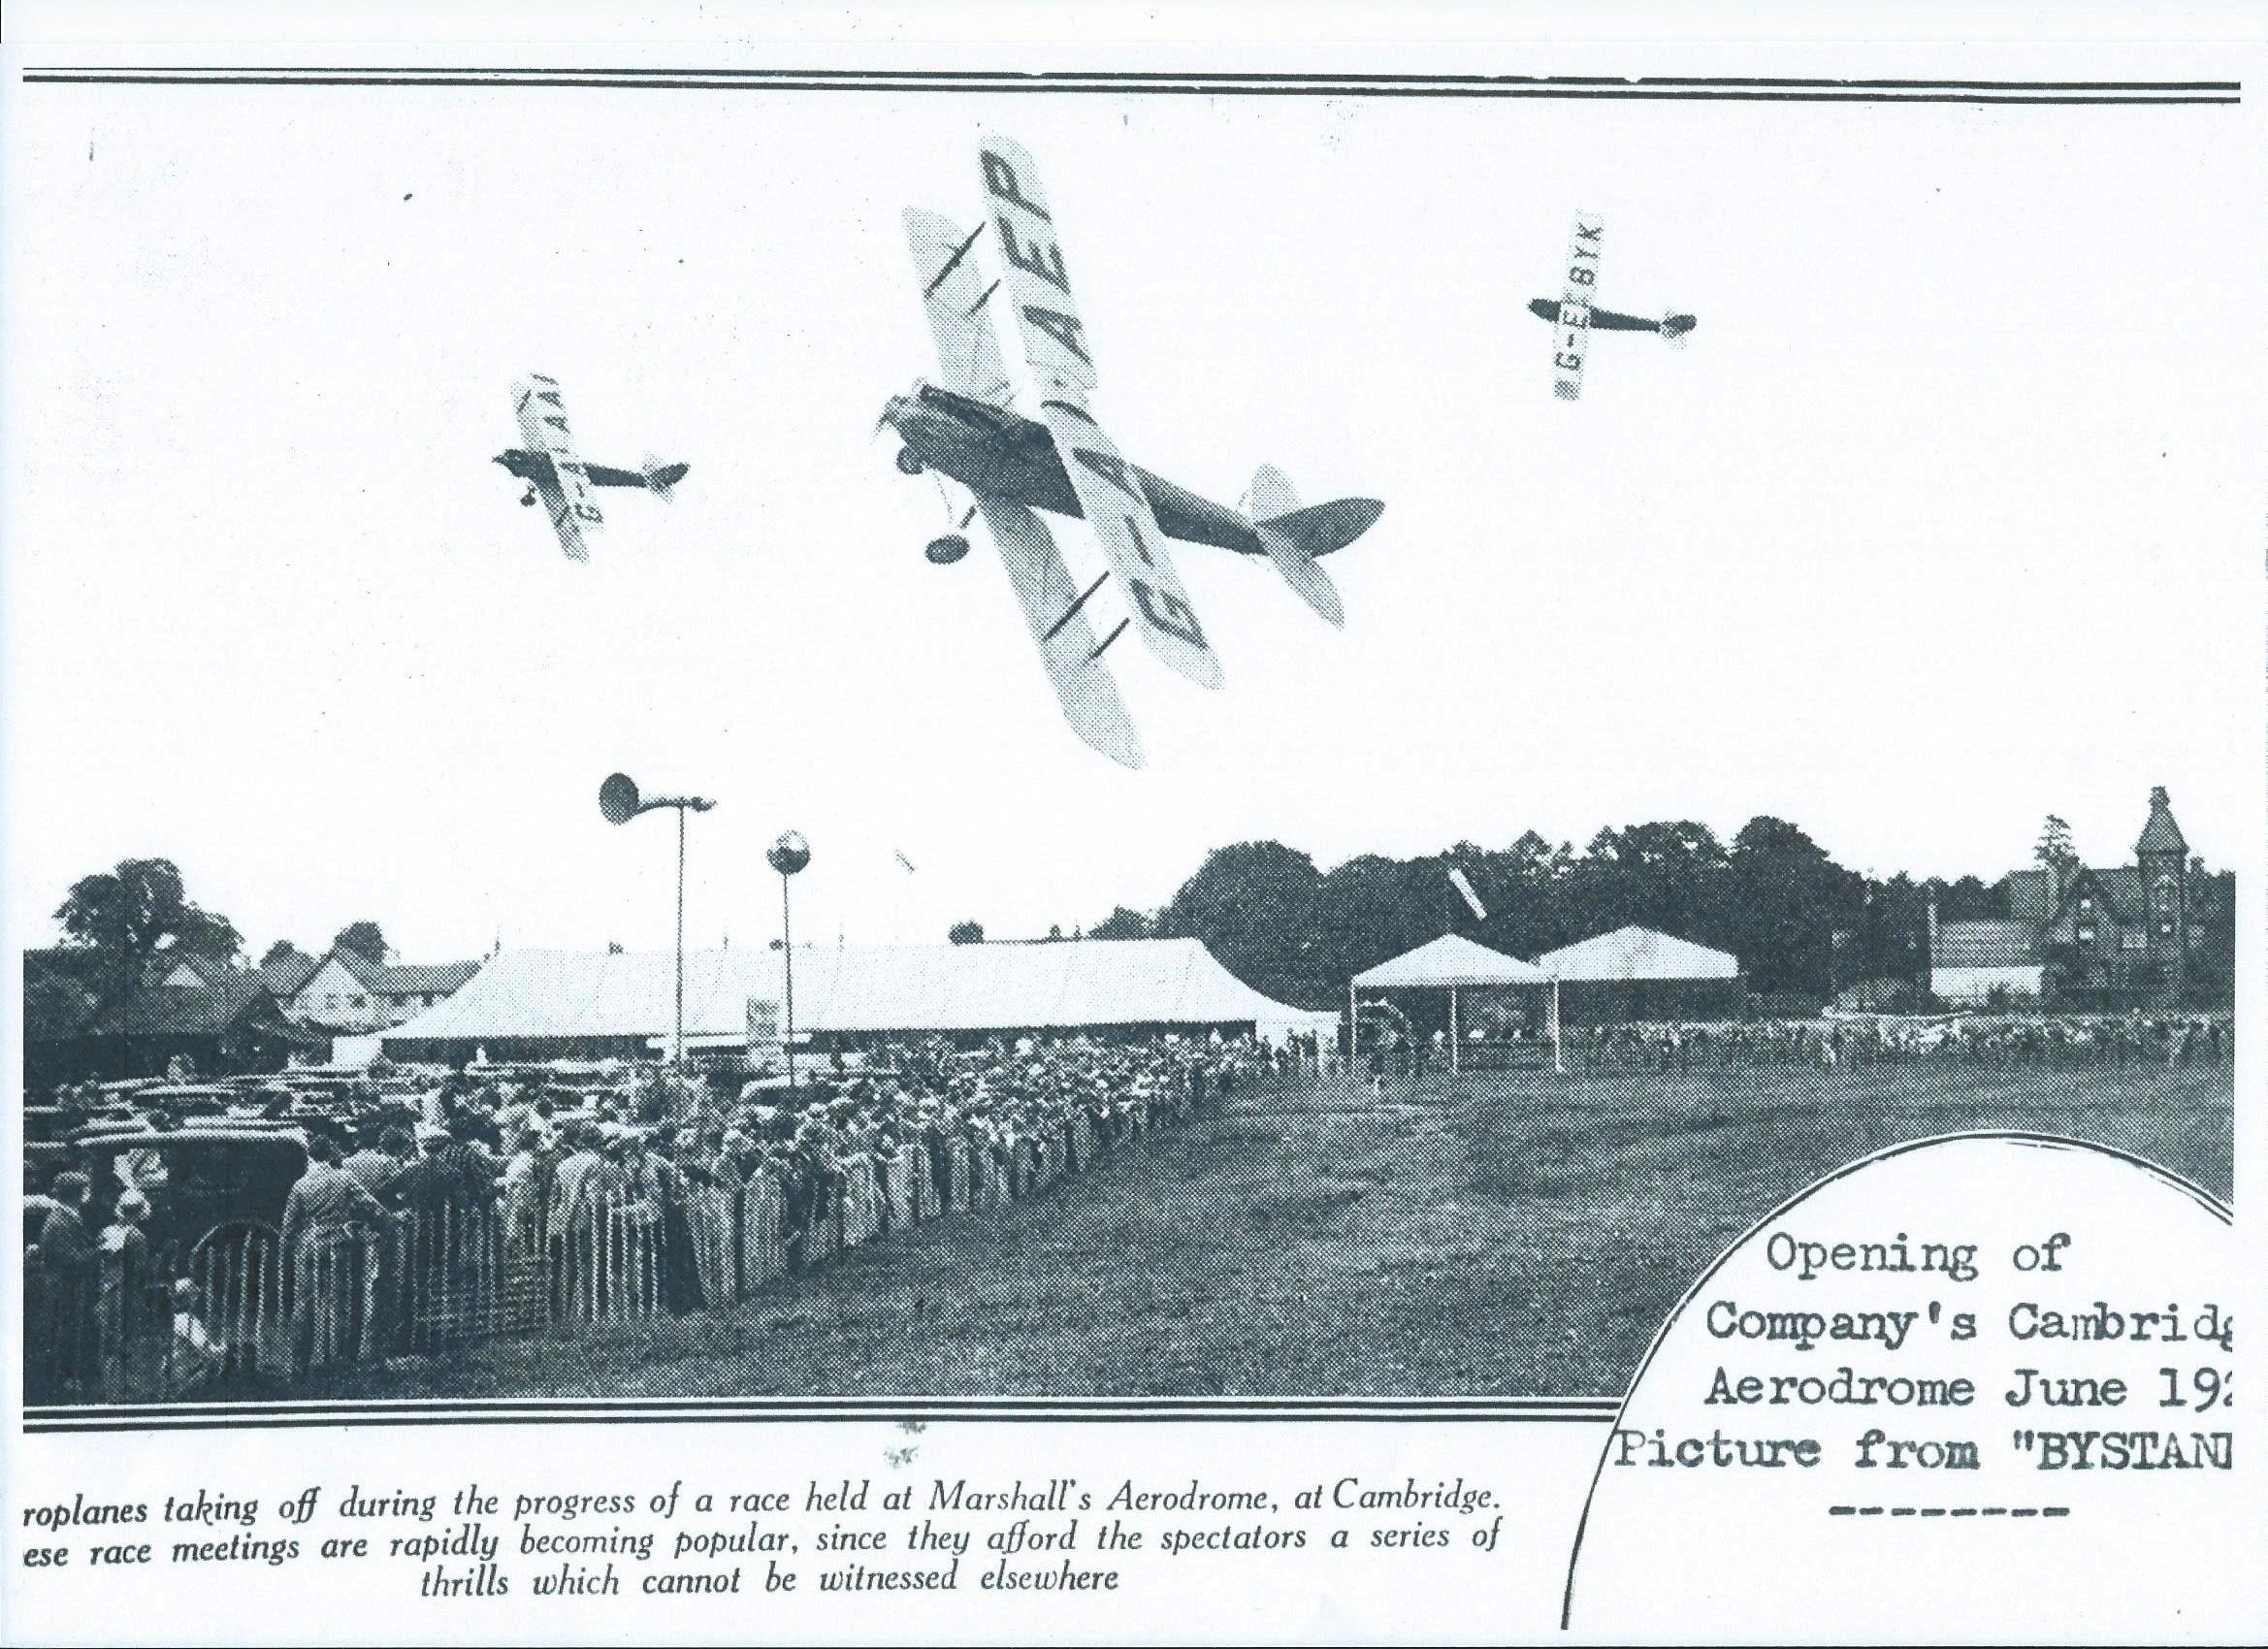 Flight over Marshall's Aerodrome, June 1929